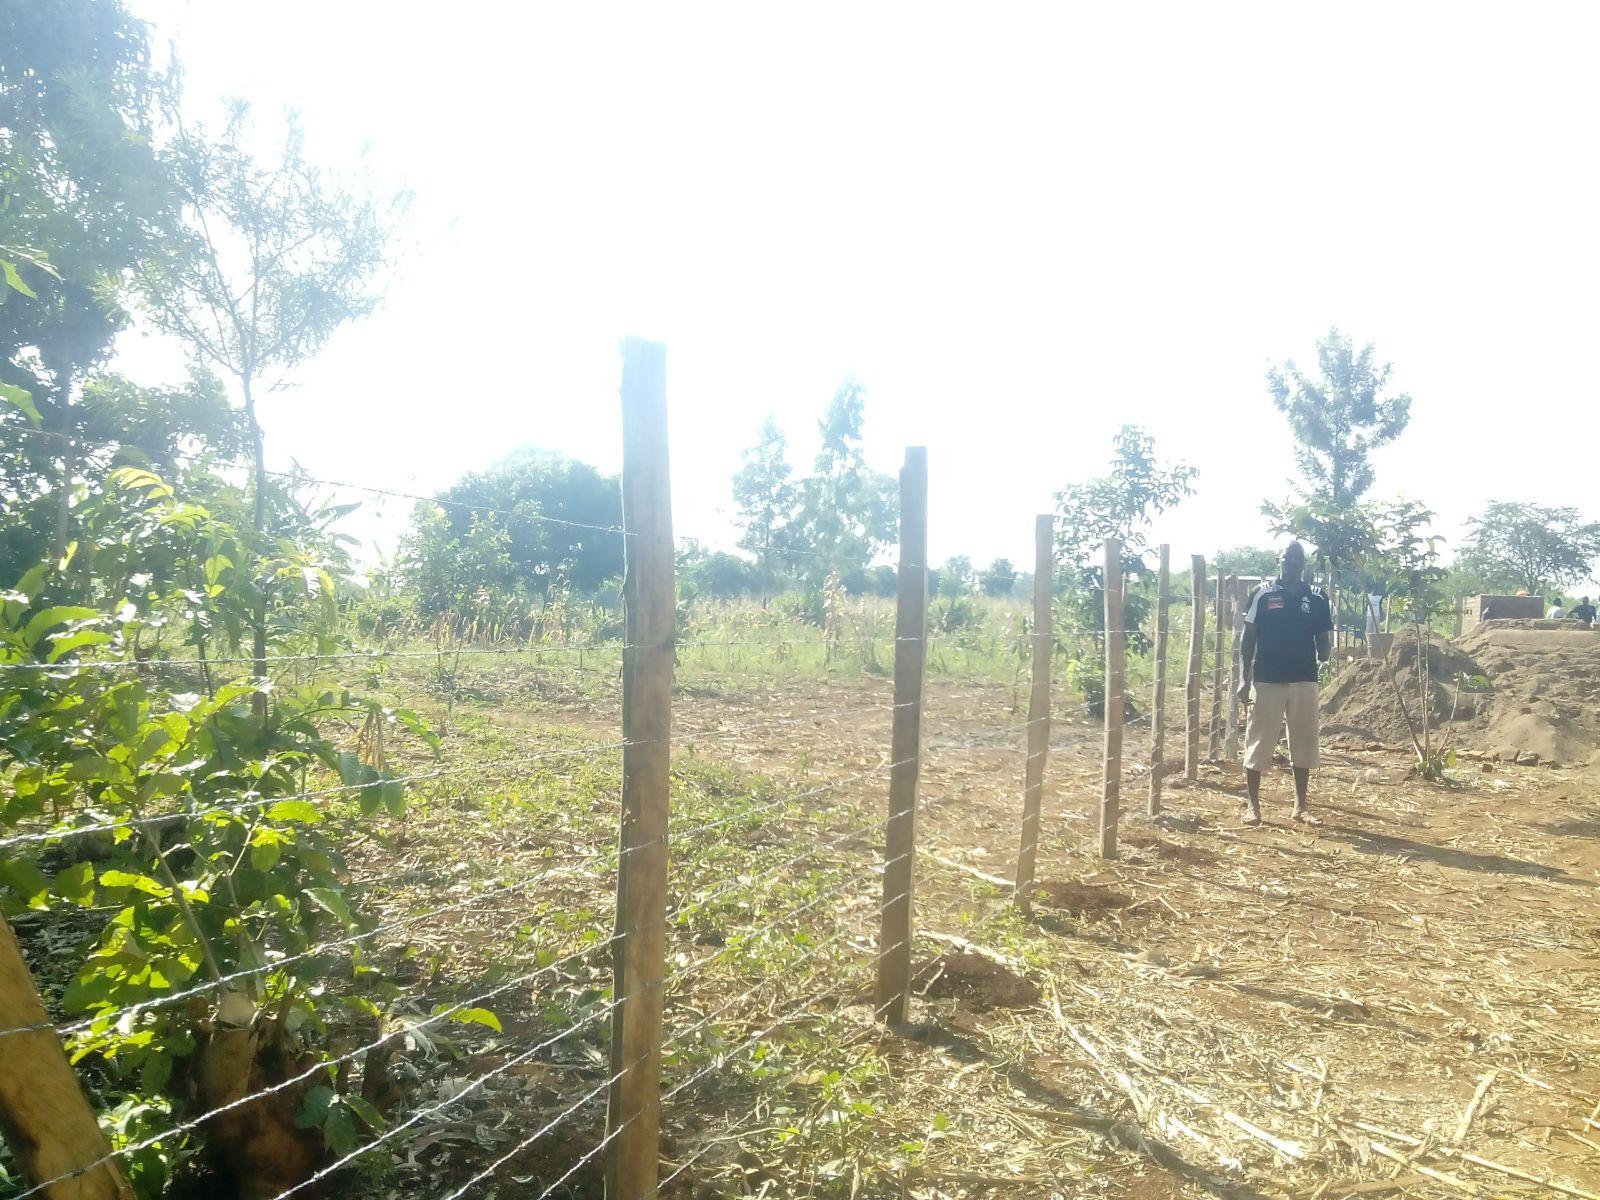 Adding fence